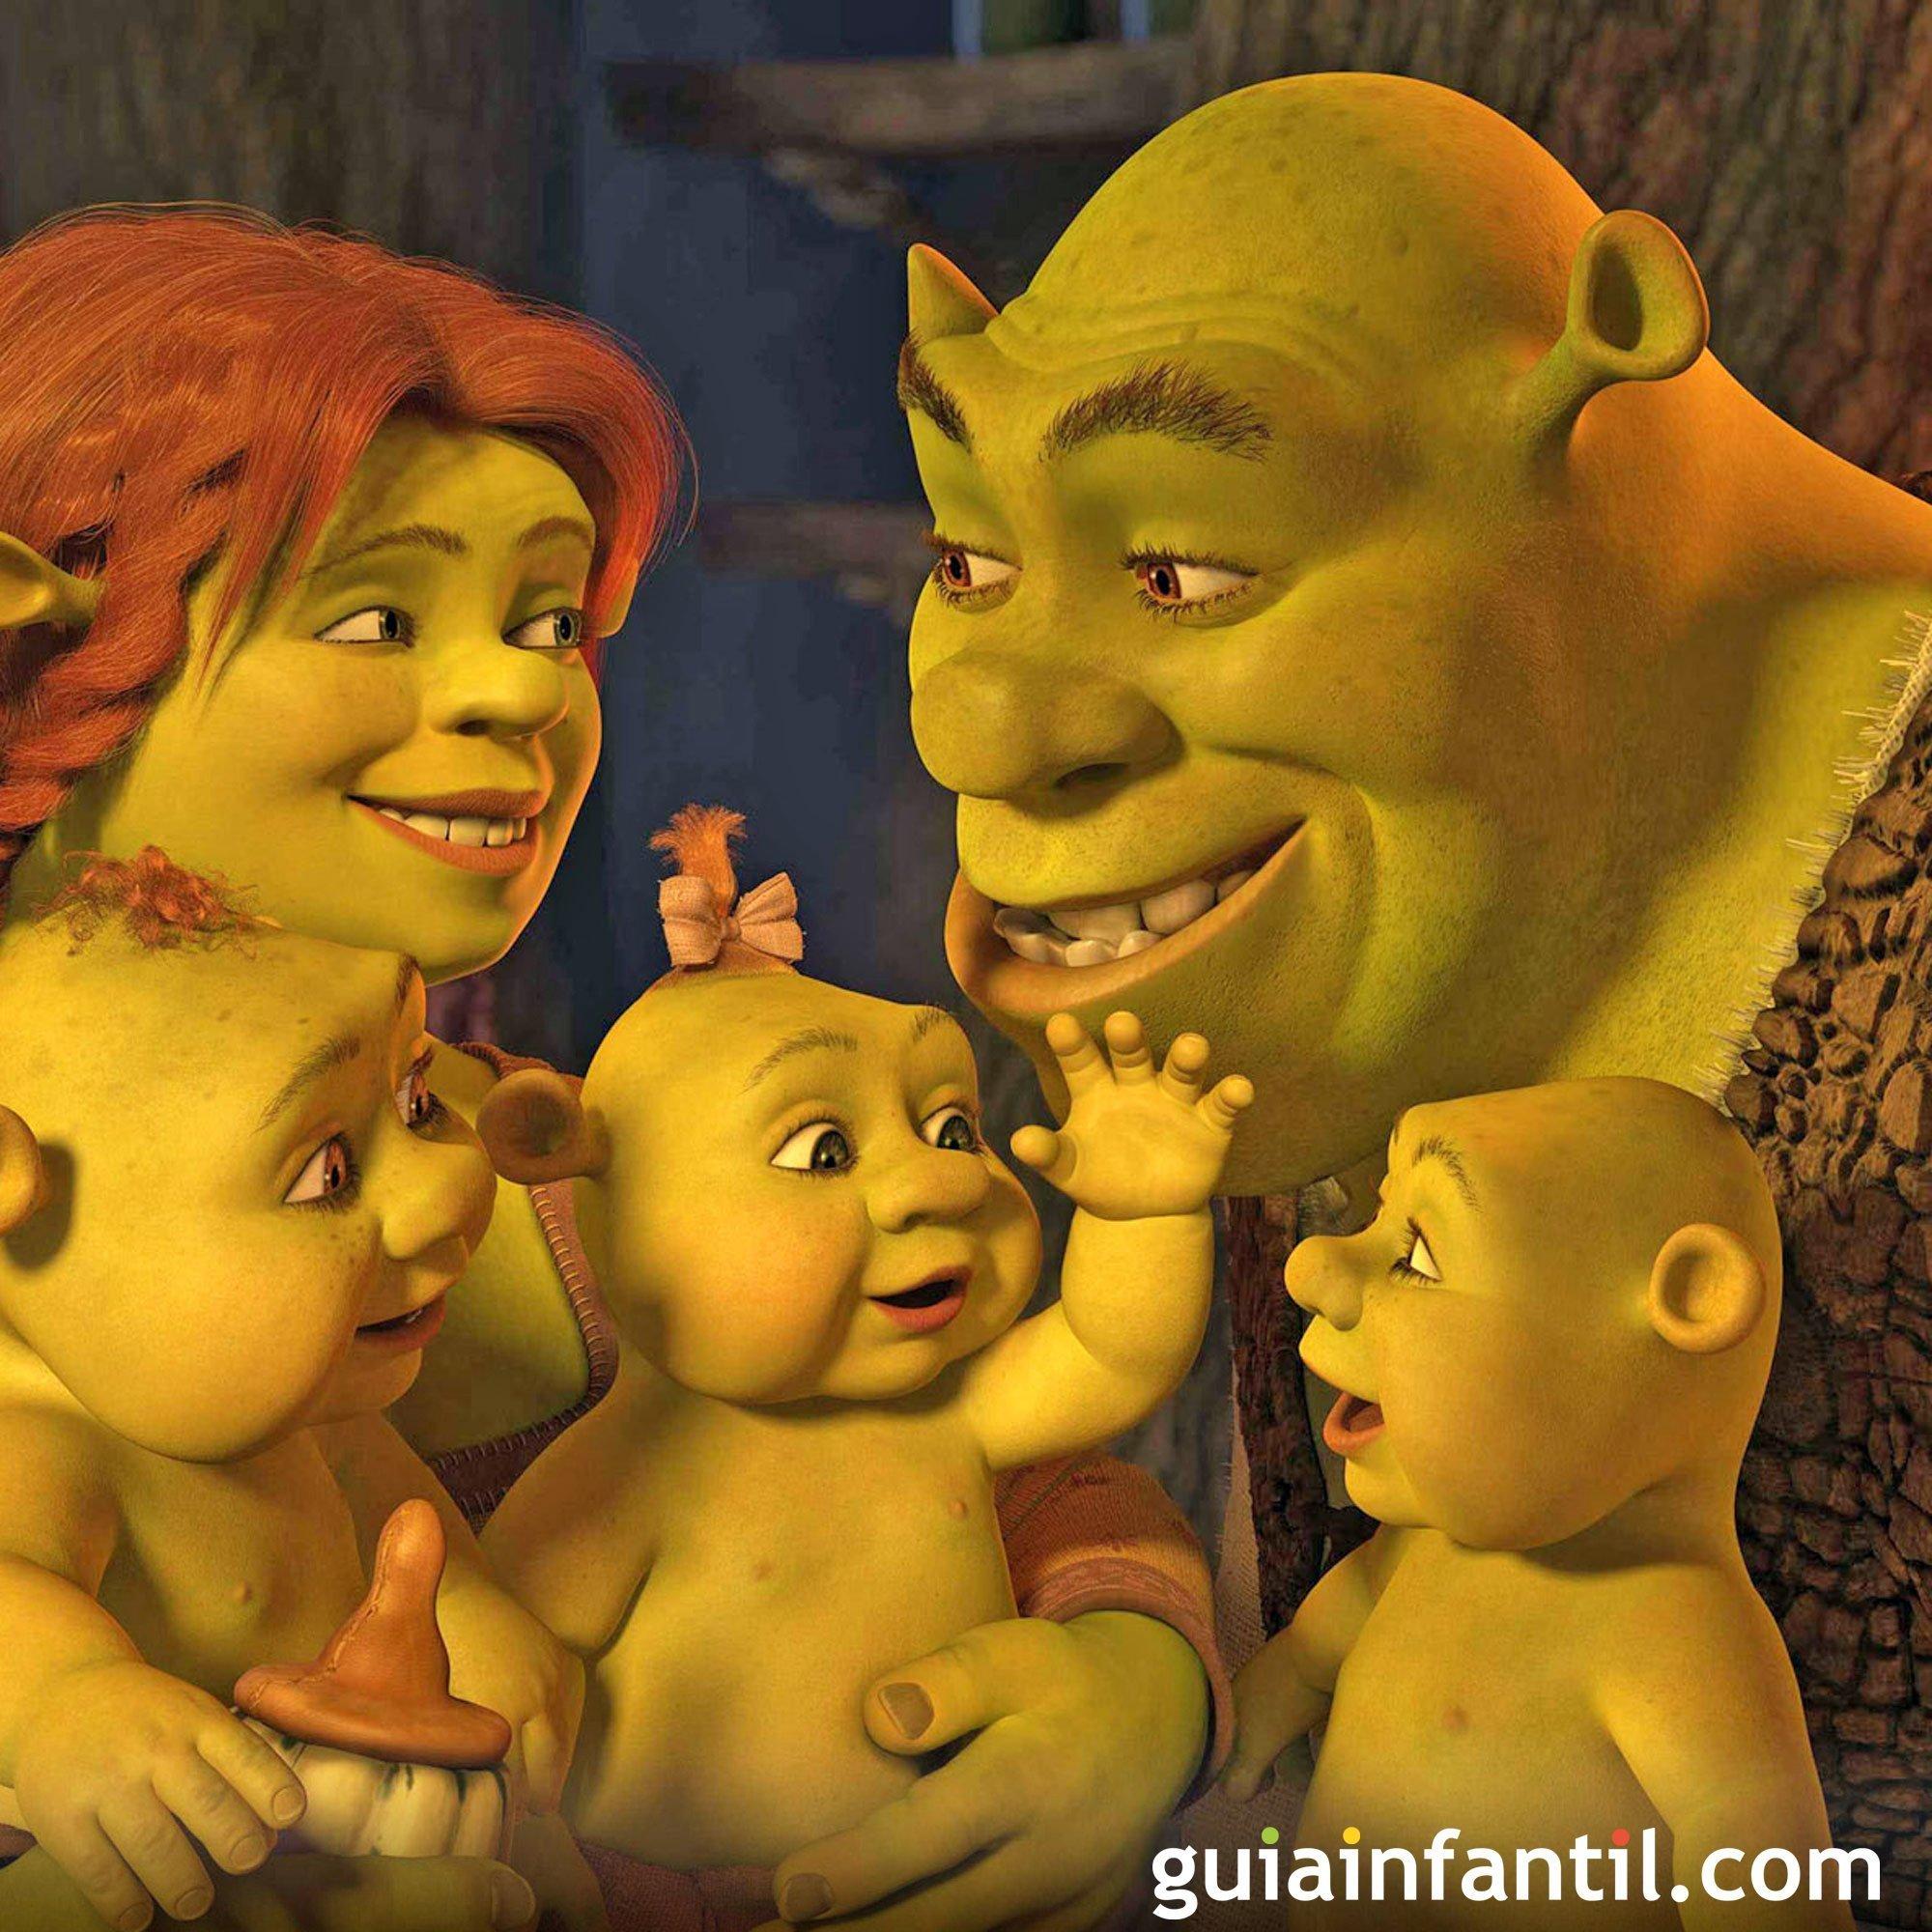 Película Shrek III. Un papá ogro genial